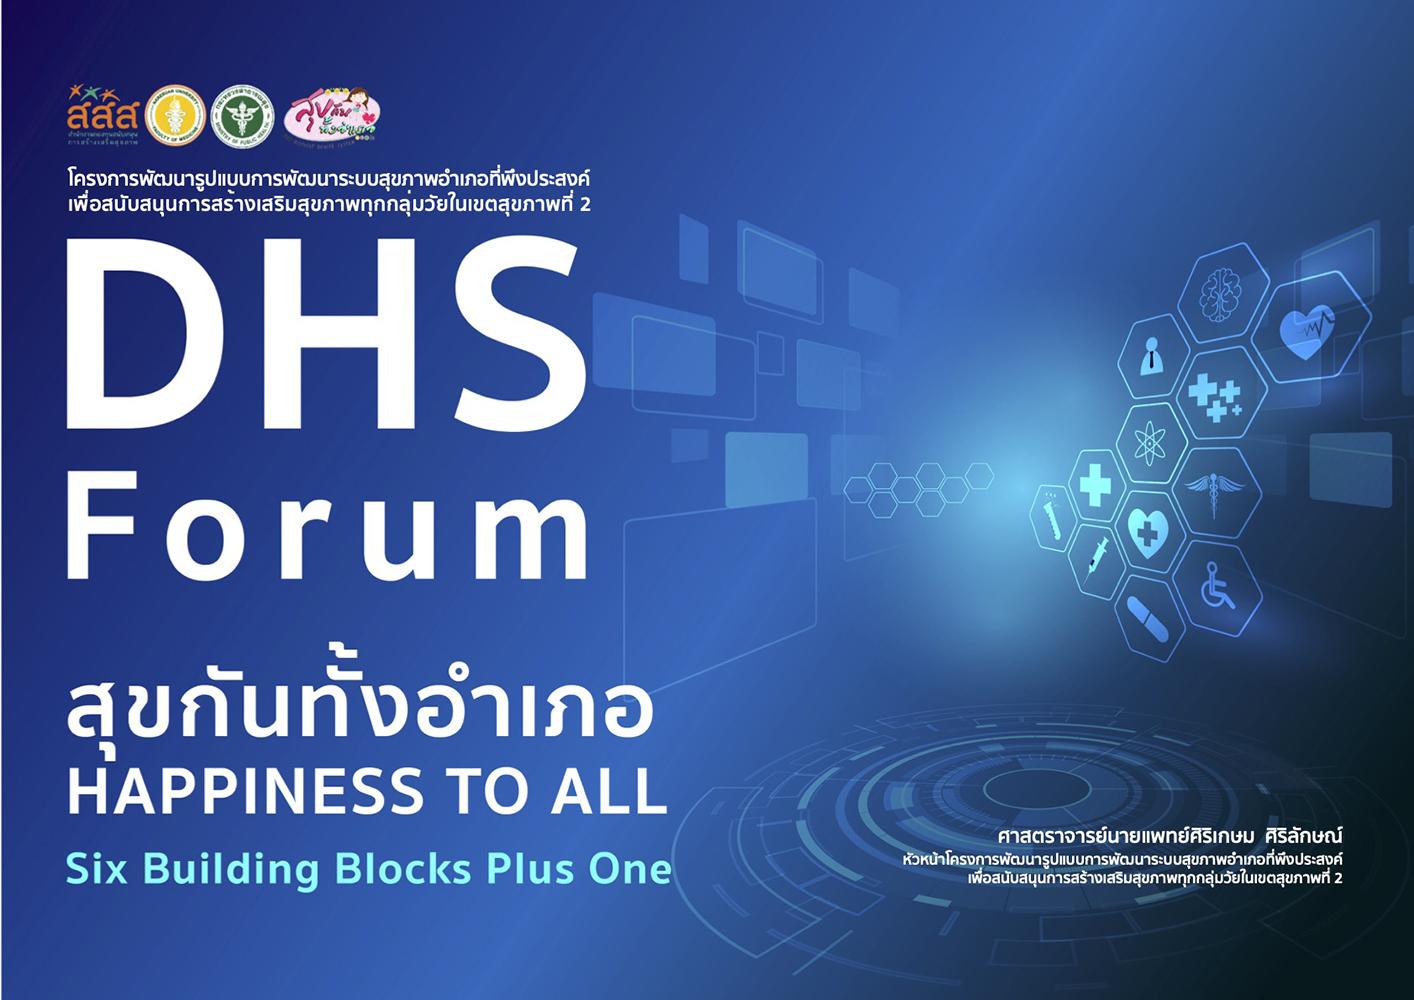 Booklet - DHS Forumสุขกันทั้งอำเภอ HAPPINESS TO ALLSix Building Blocks Plus One